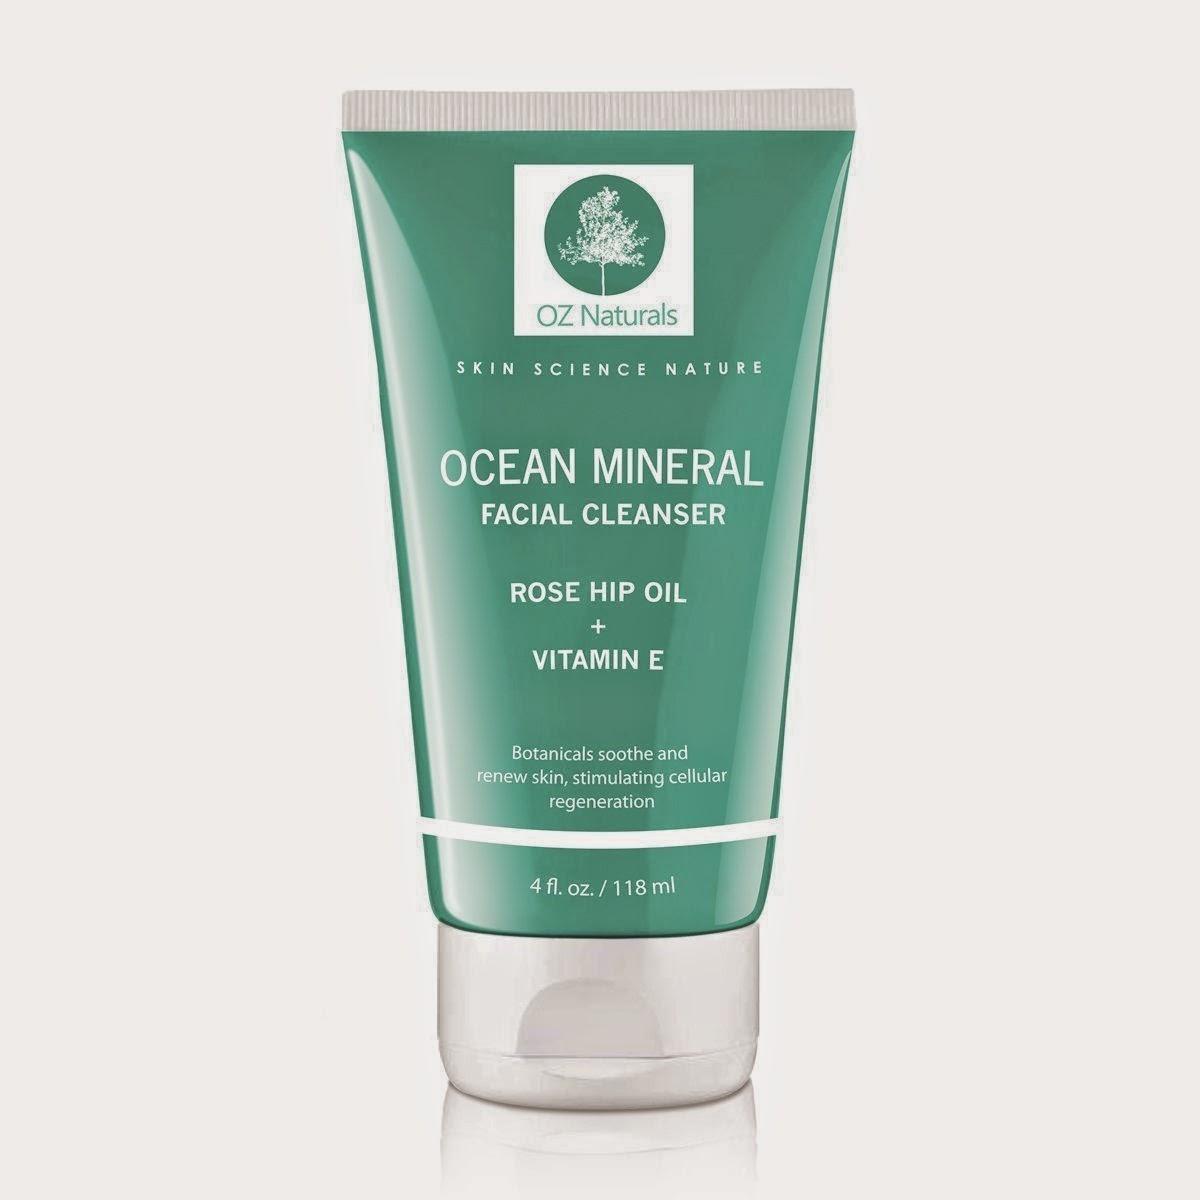 Oz Natural Facial Cleanser